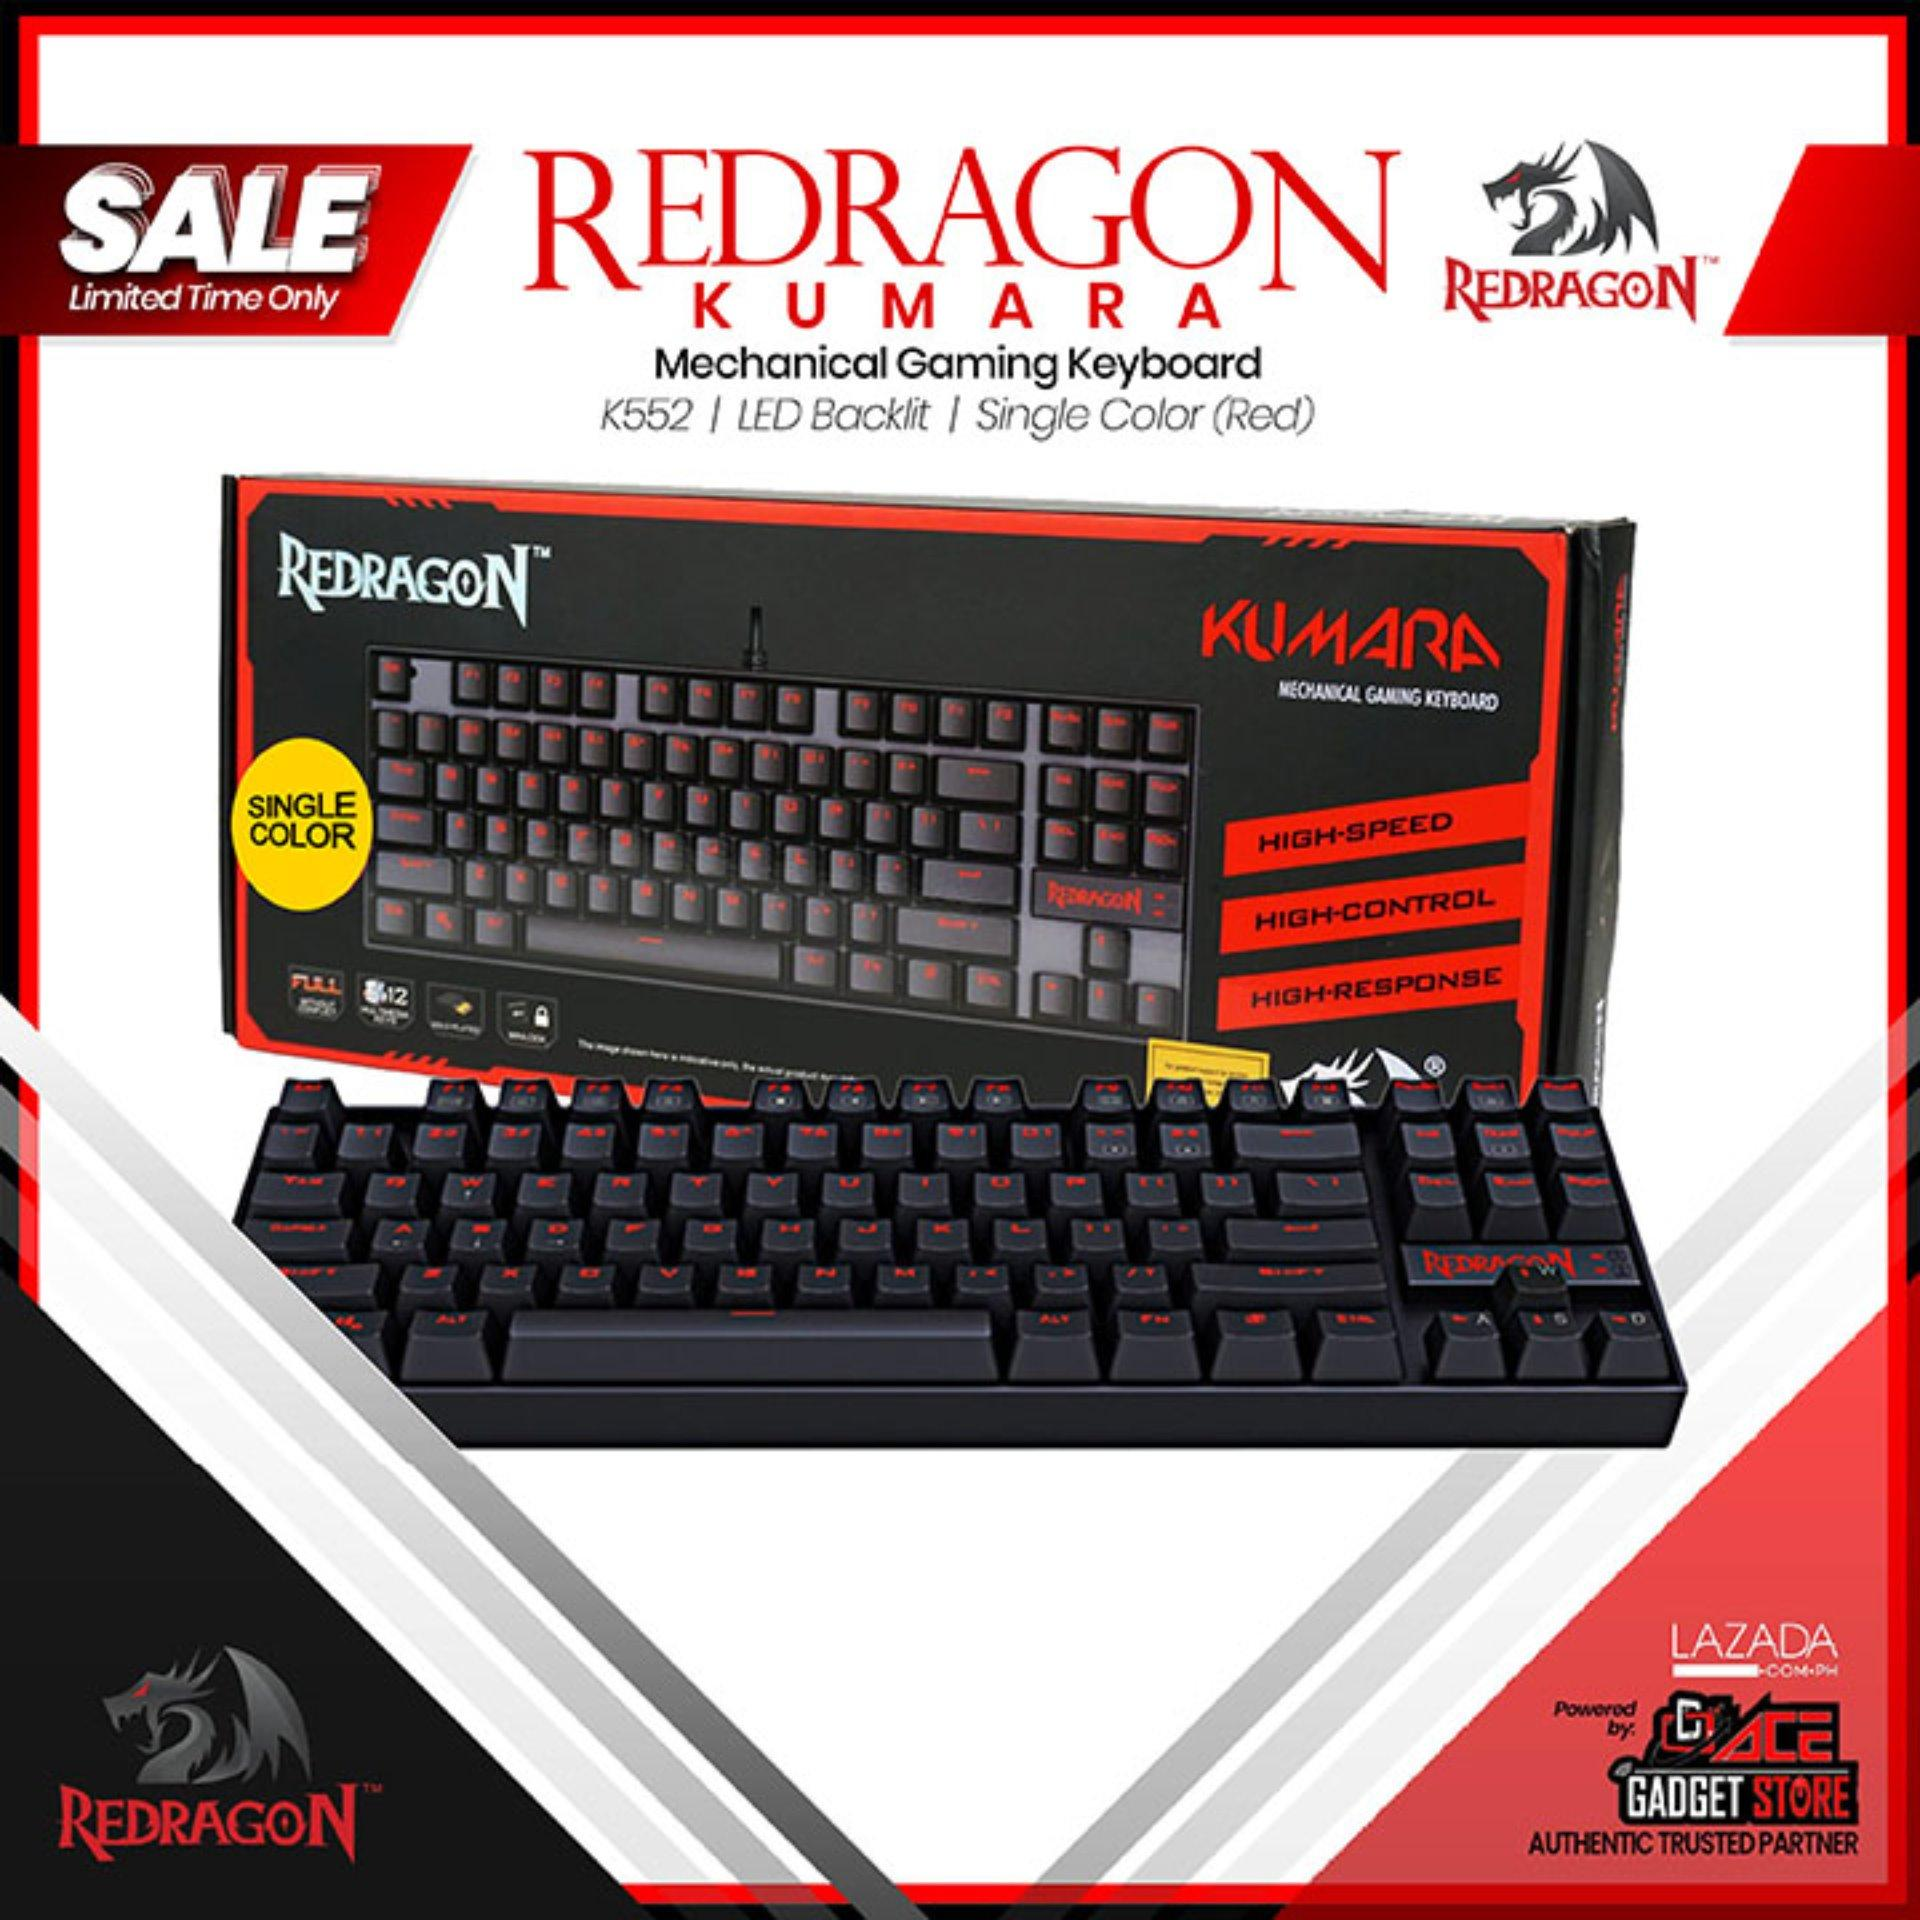 b00253e8a8e Redragon K552 KUMARA LED Backlit Mechanical Gaming Keyboard Single Color  Backlit (Red)